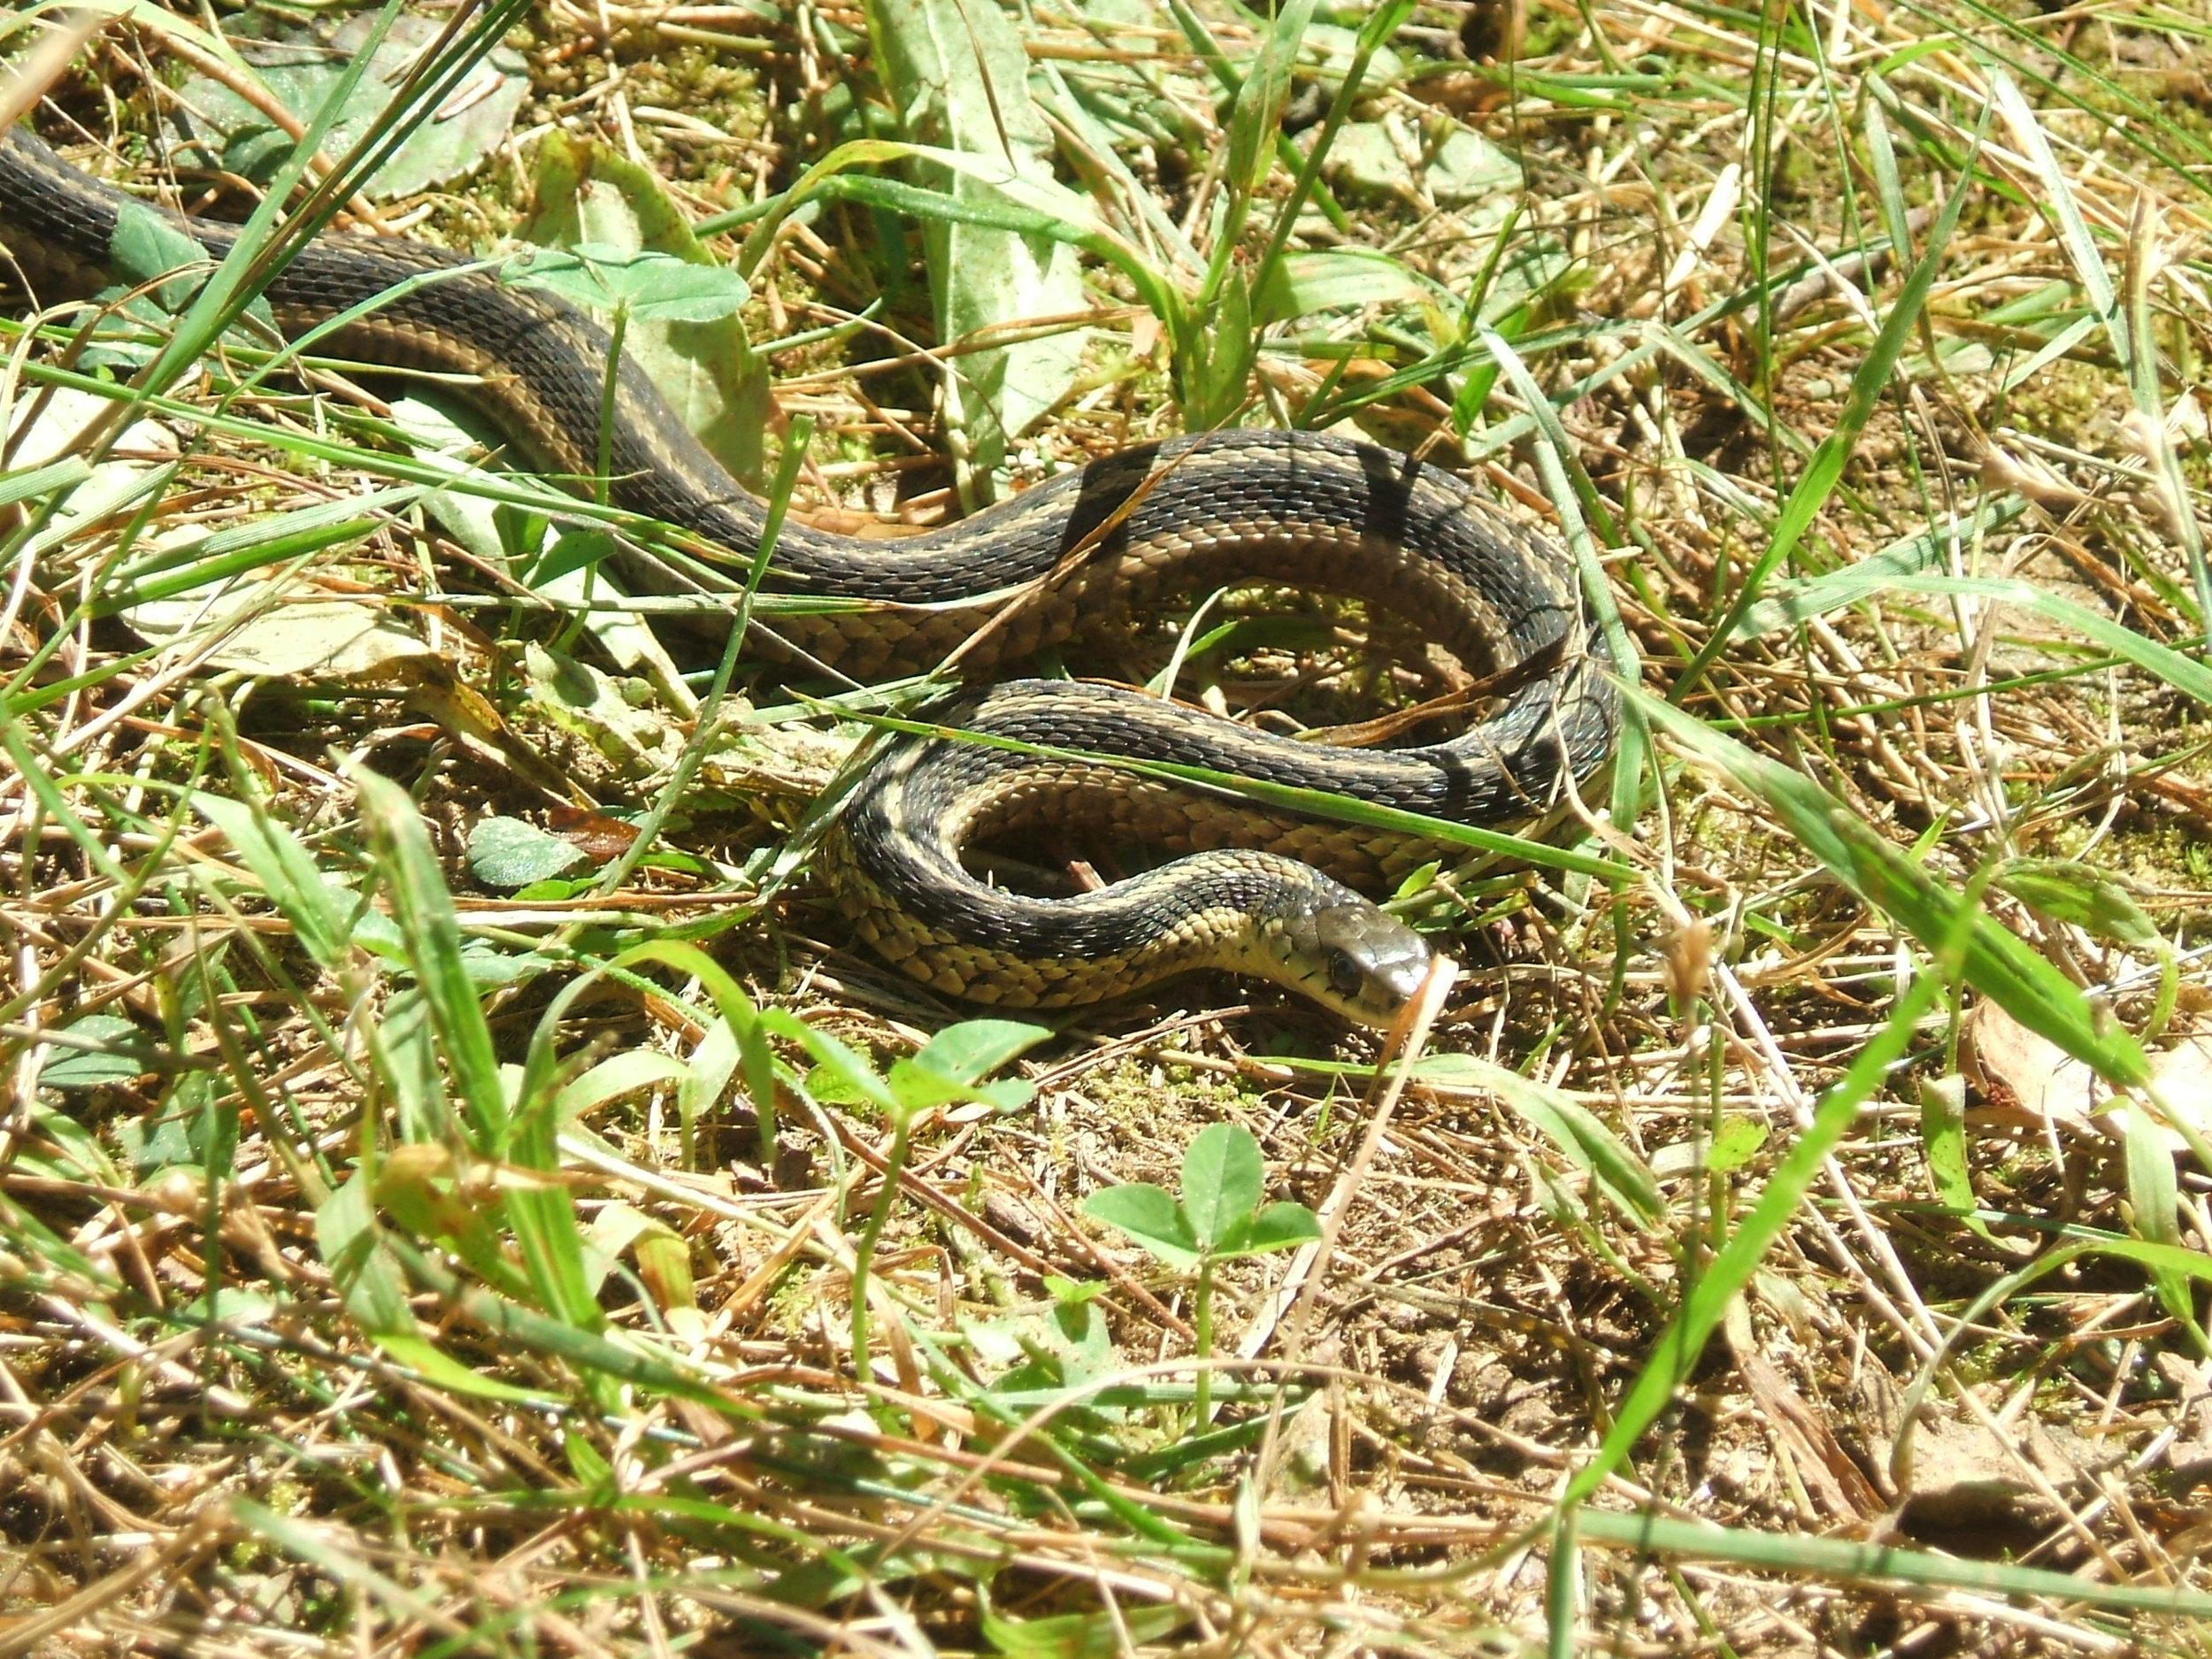 26a Garter Snake.JPG